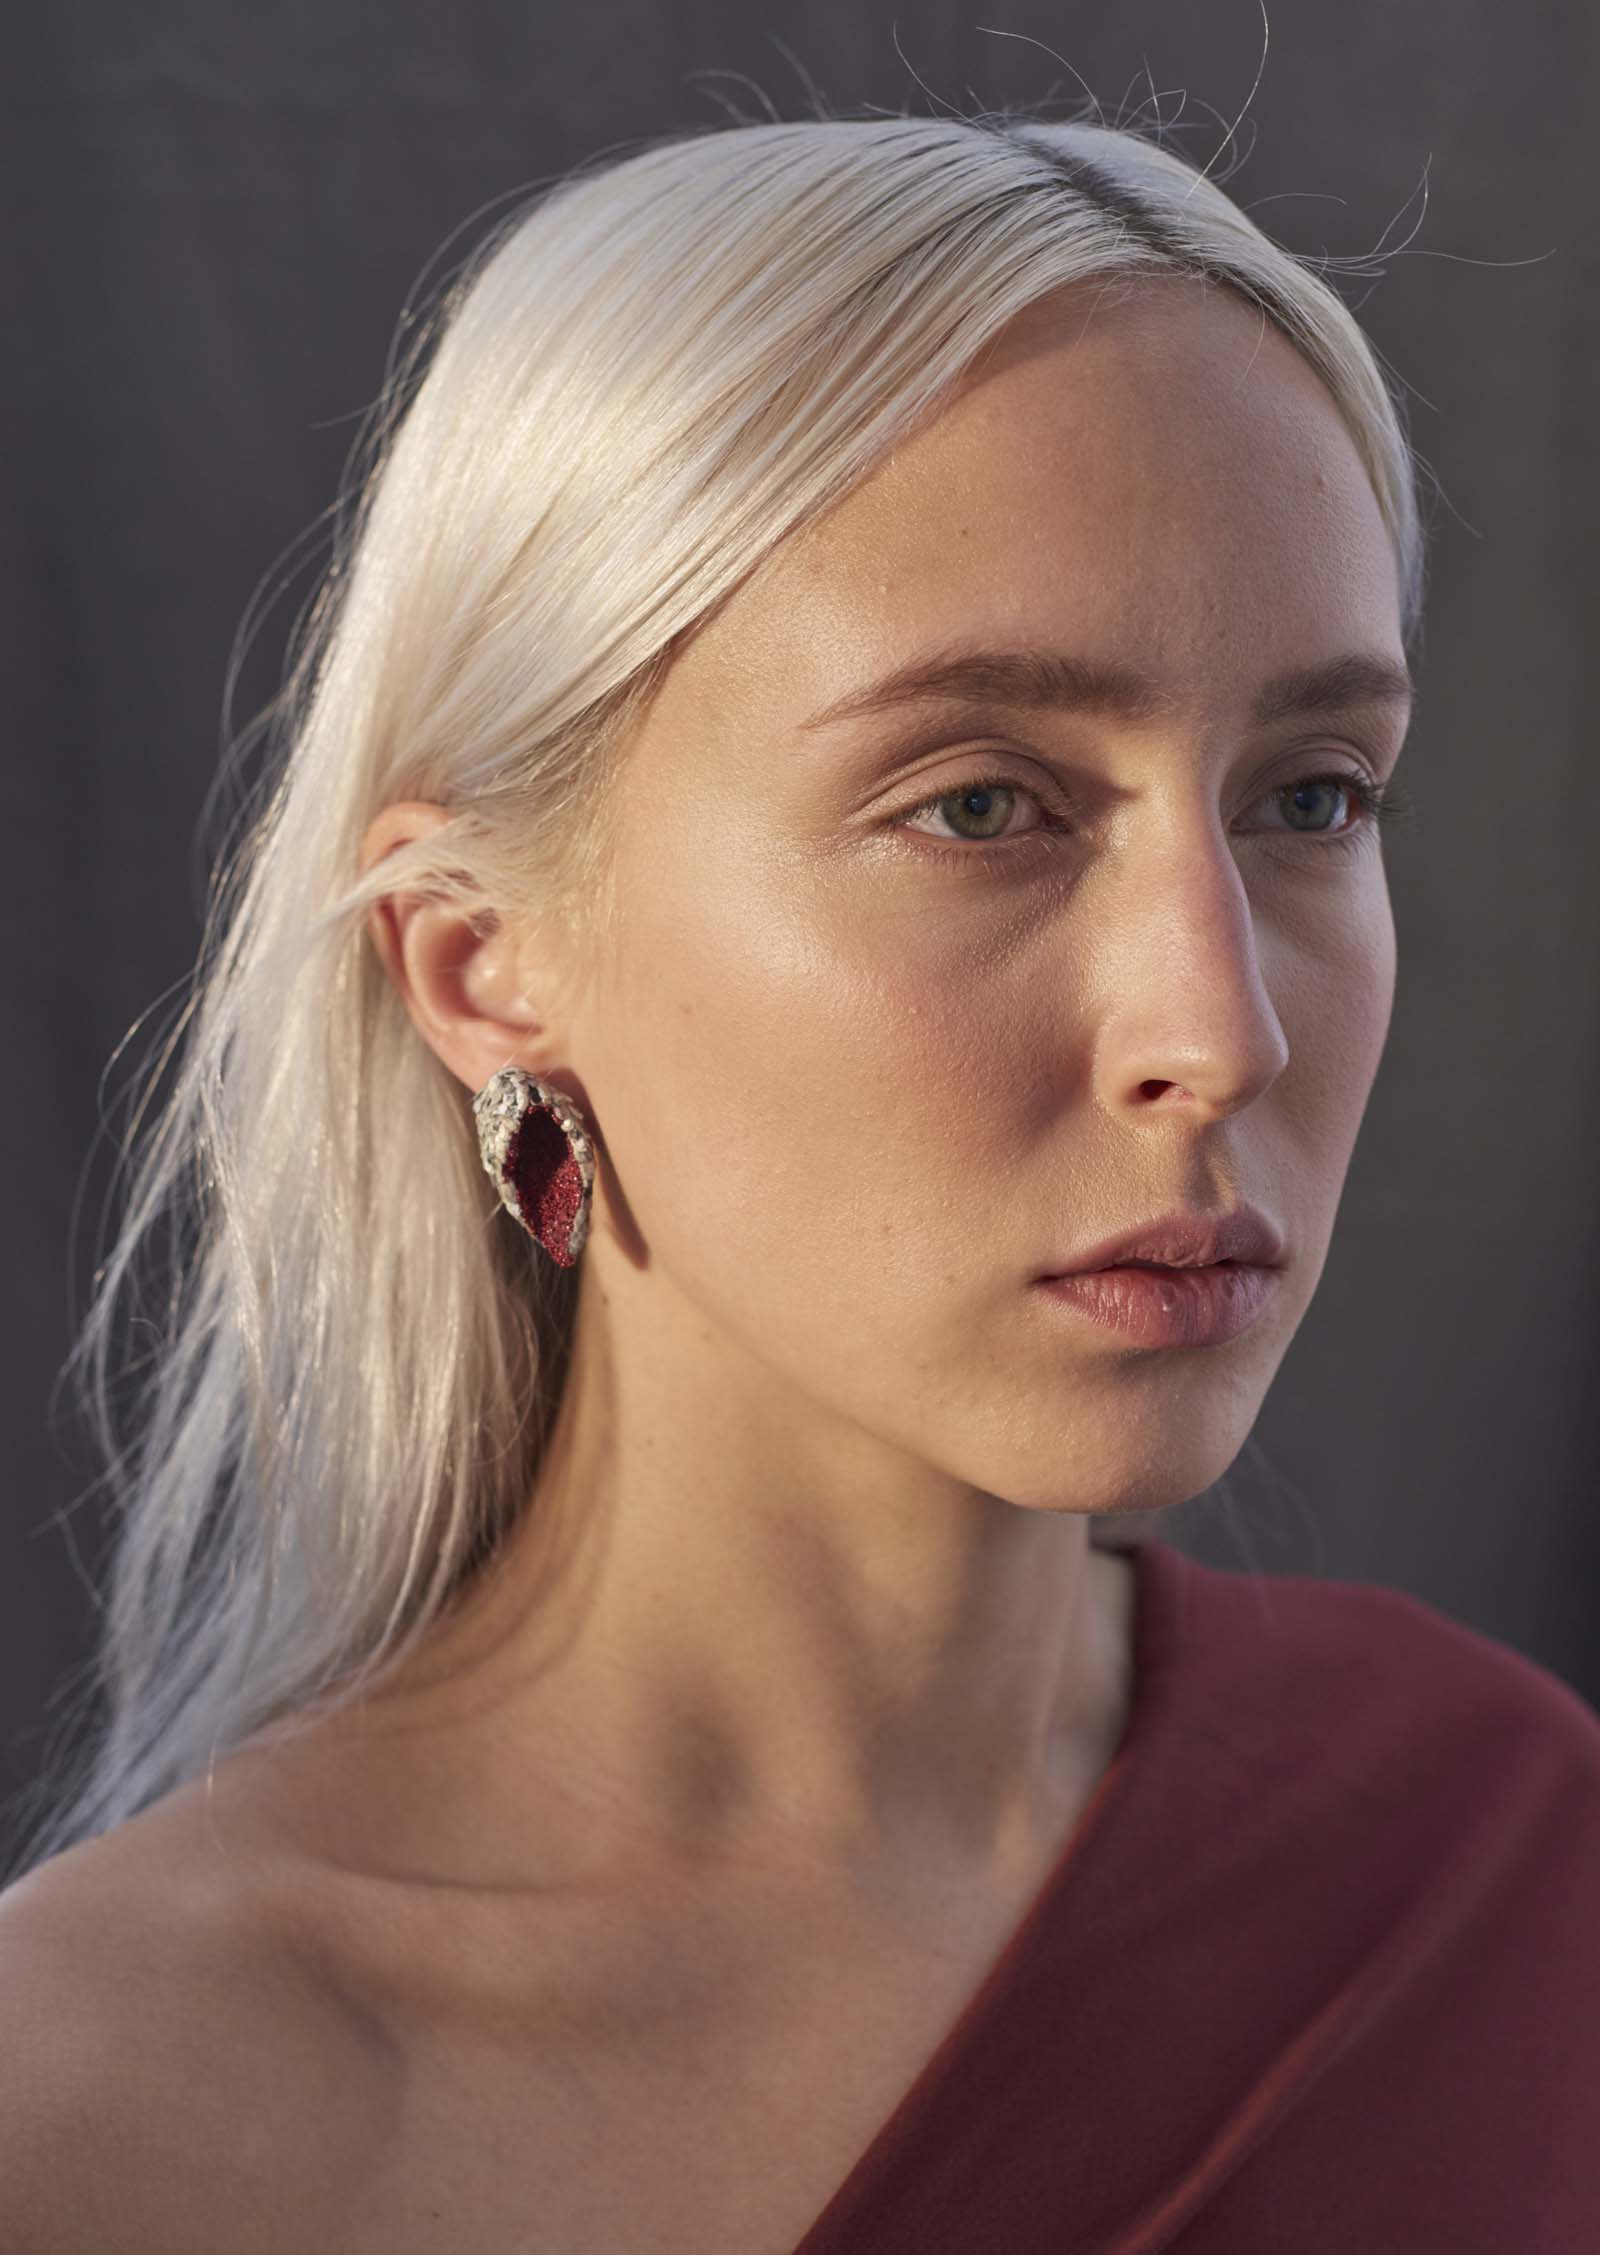 """Wing Shaped Karma Chroma Earrings"" I Earrings, 2016 I Graffiti, almond shells, glass, silver  I Photo: Laurens Grigoleit"